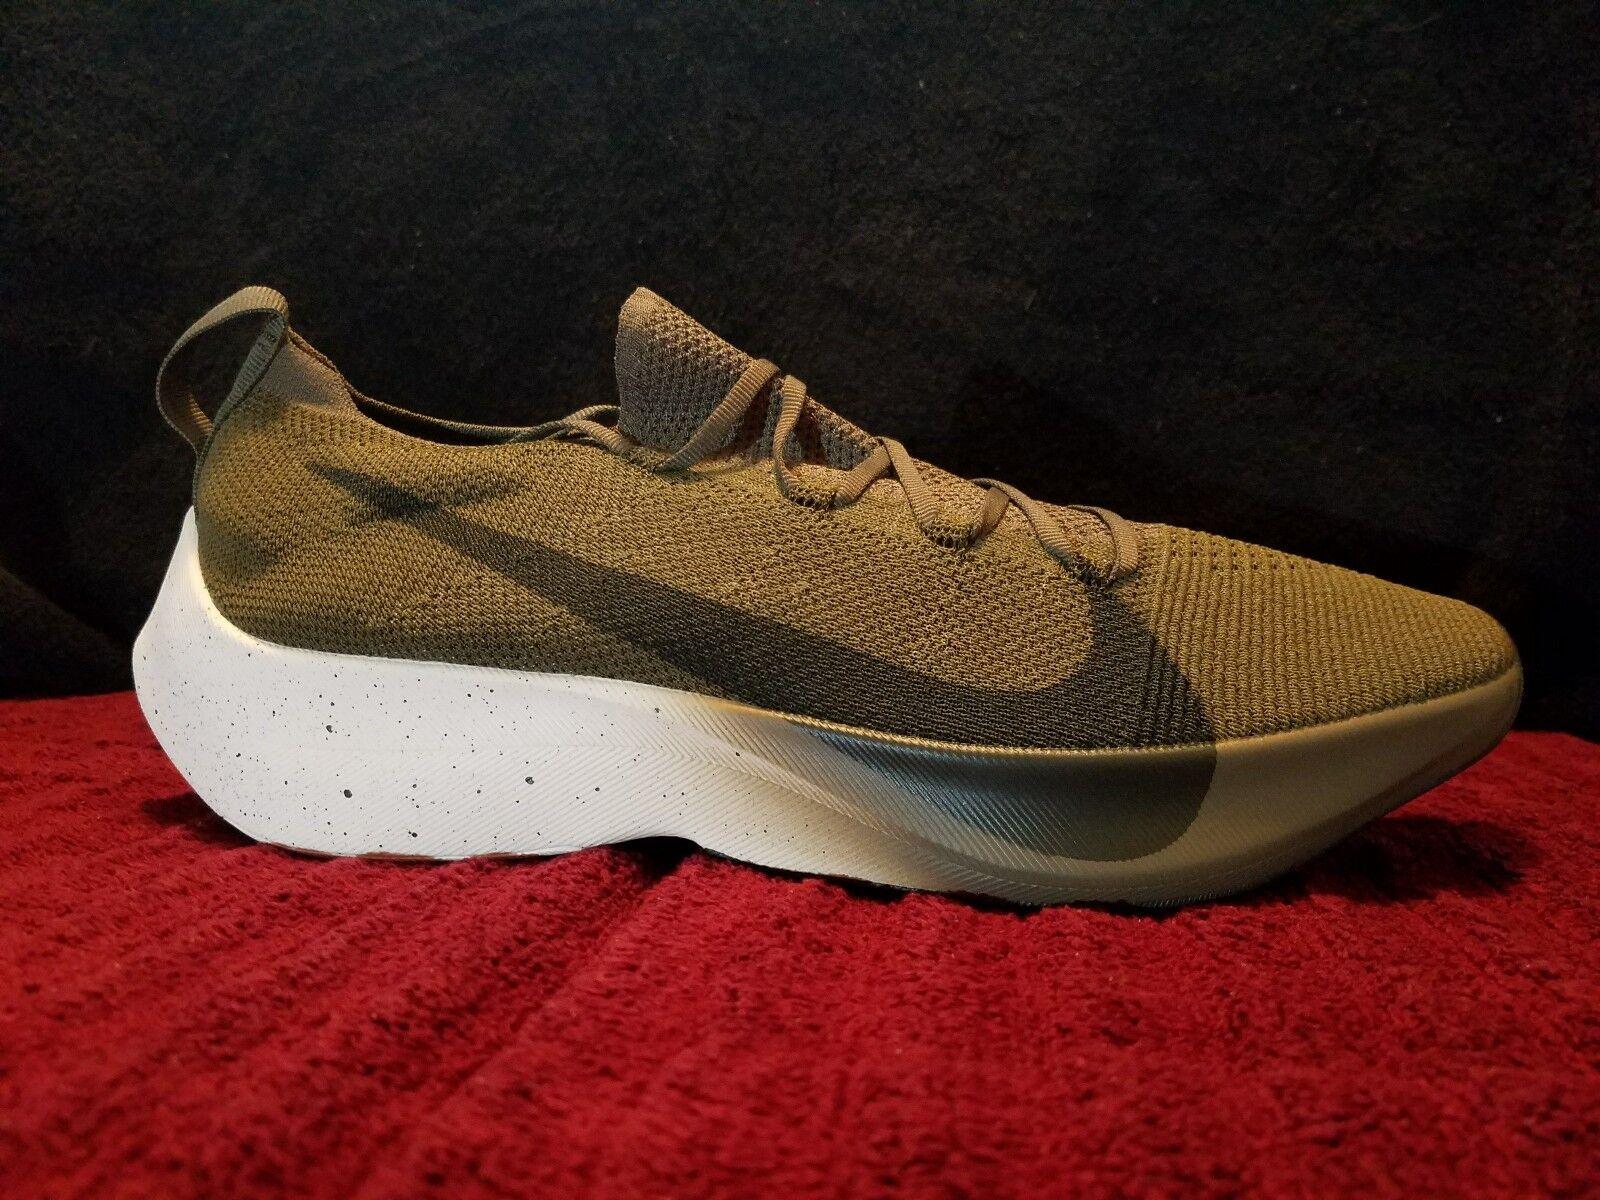 Nike React Vapor Street Flyknit Olive AQ1763-201 size 11